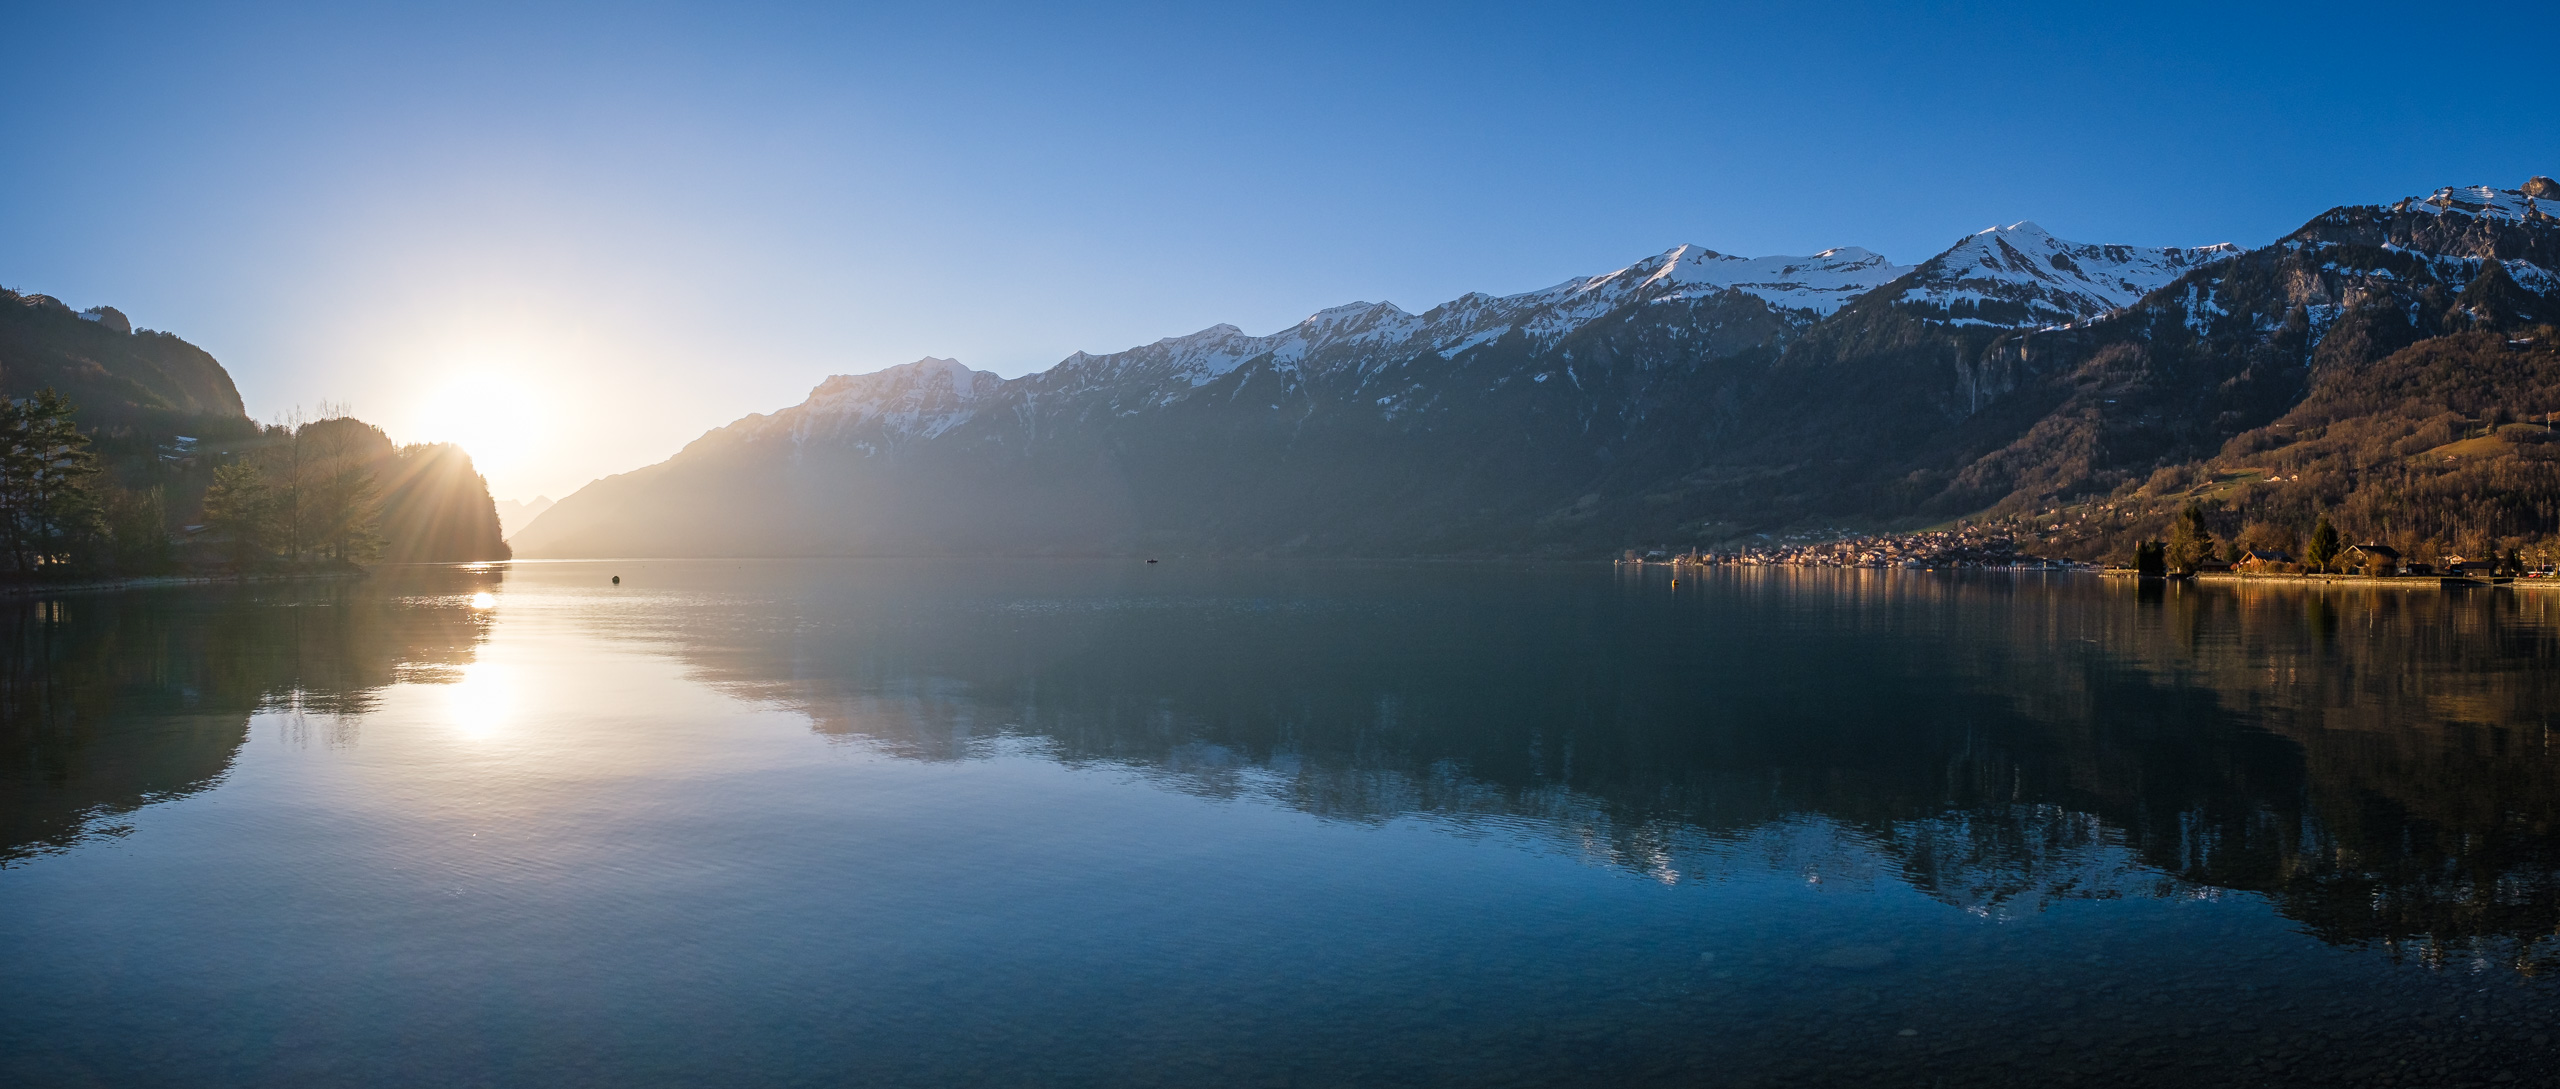 Sunset in Brienz